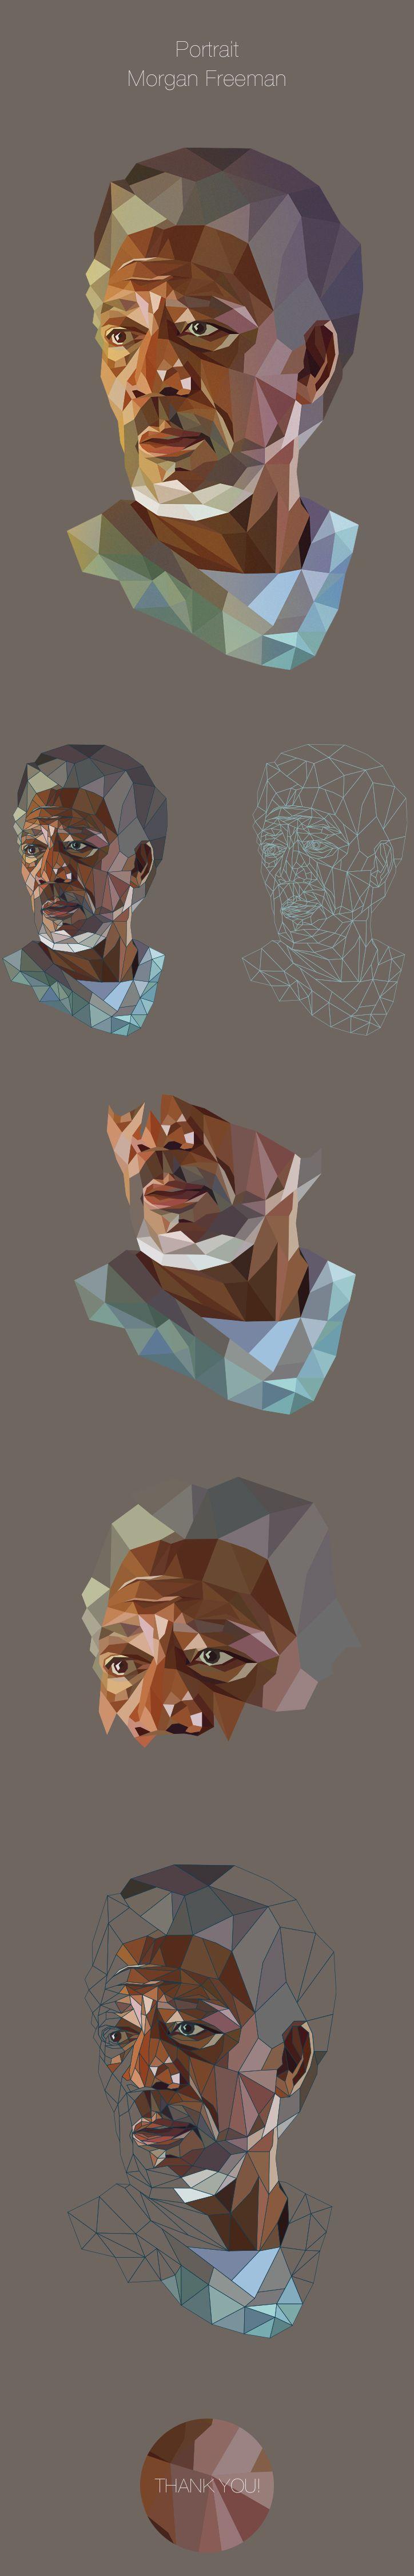 Morgan-Low Poly Portrait on Behance